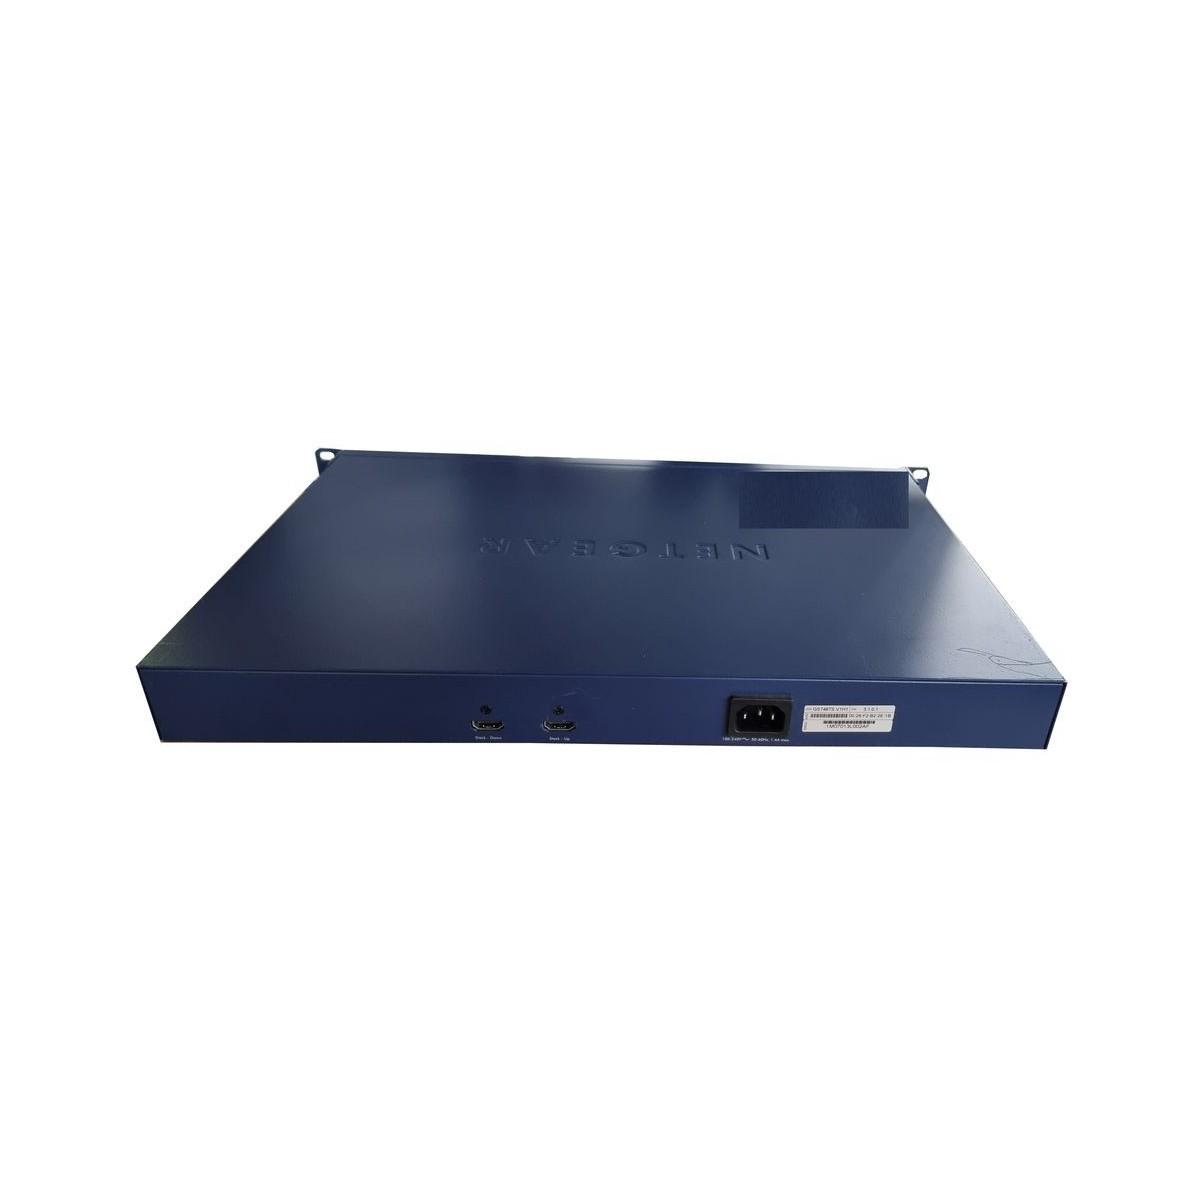 PROCESOR INTEL XEON E5-2660 8x2,20 GHz SR0KK